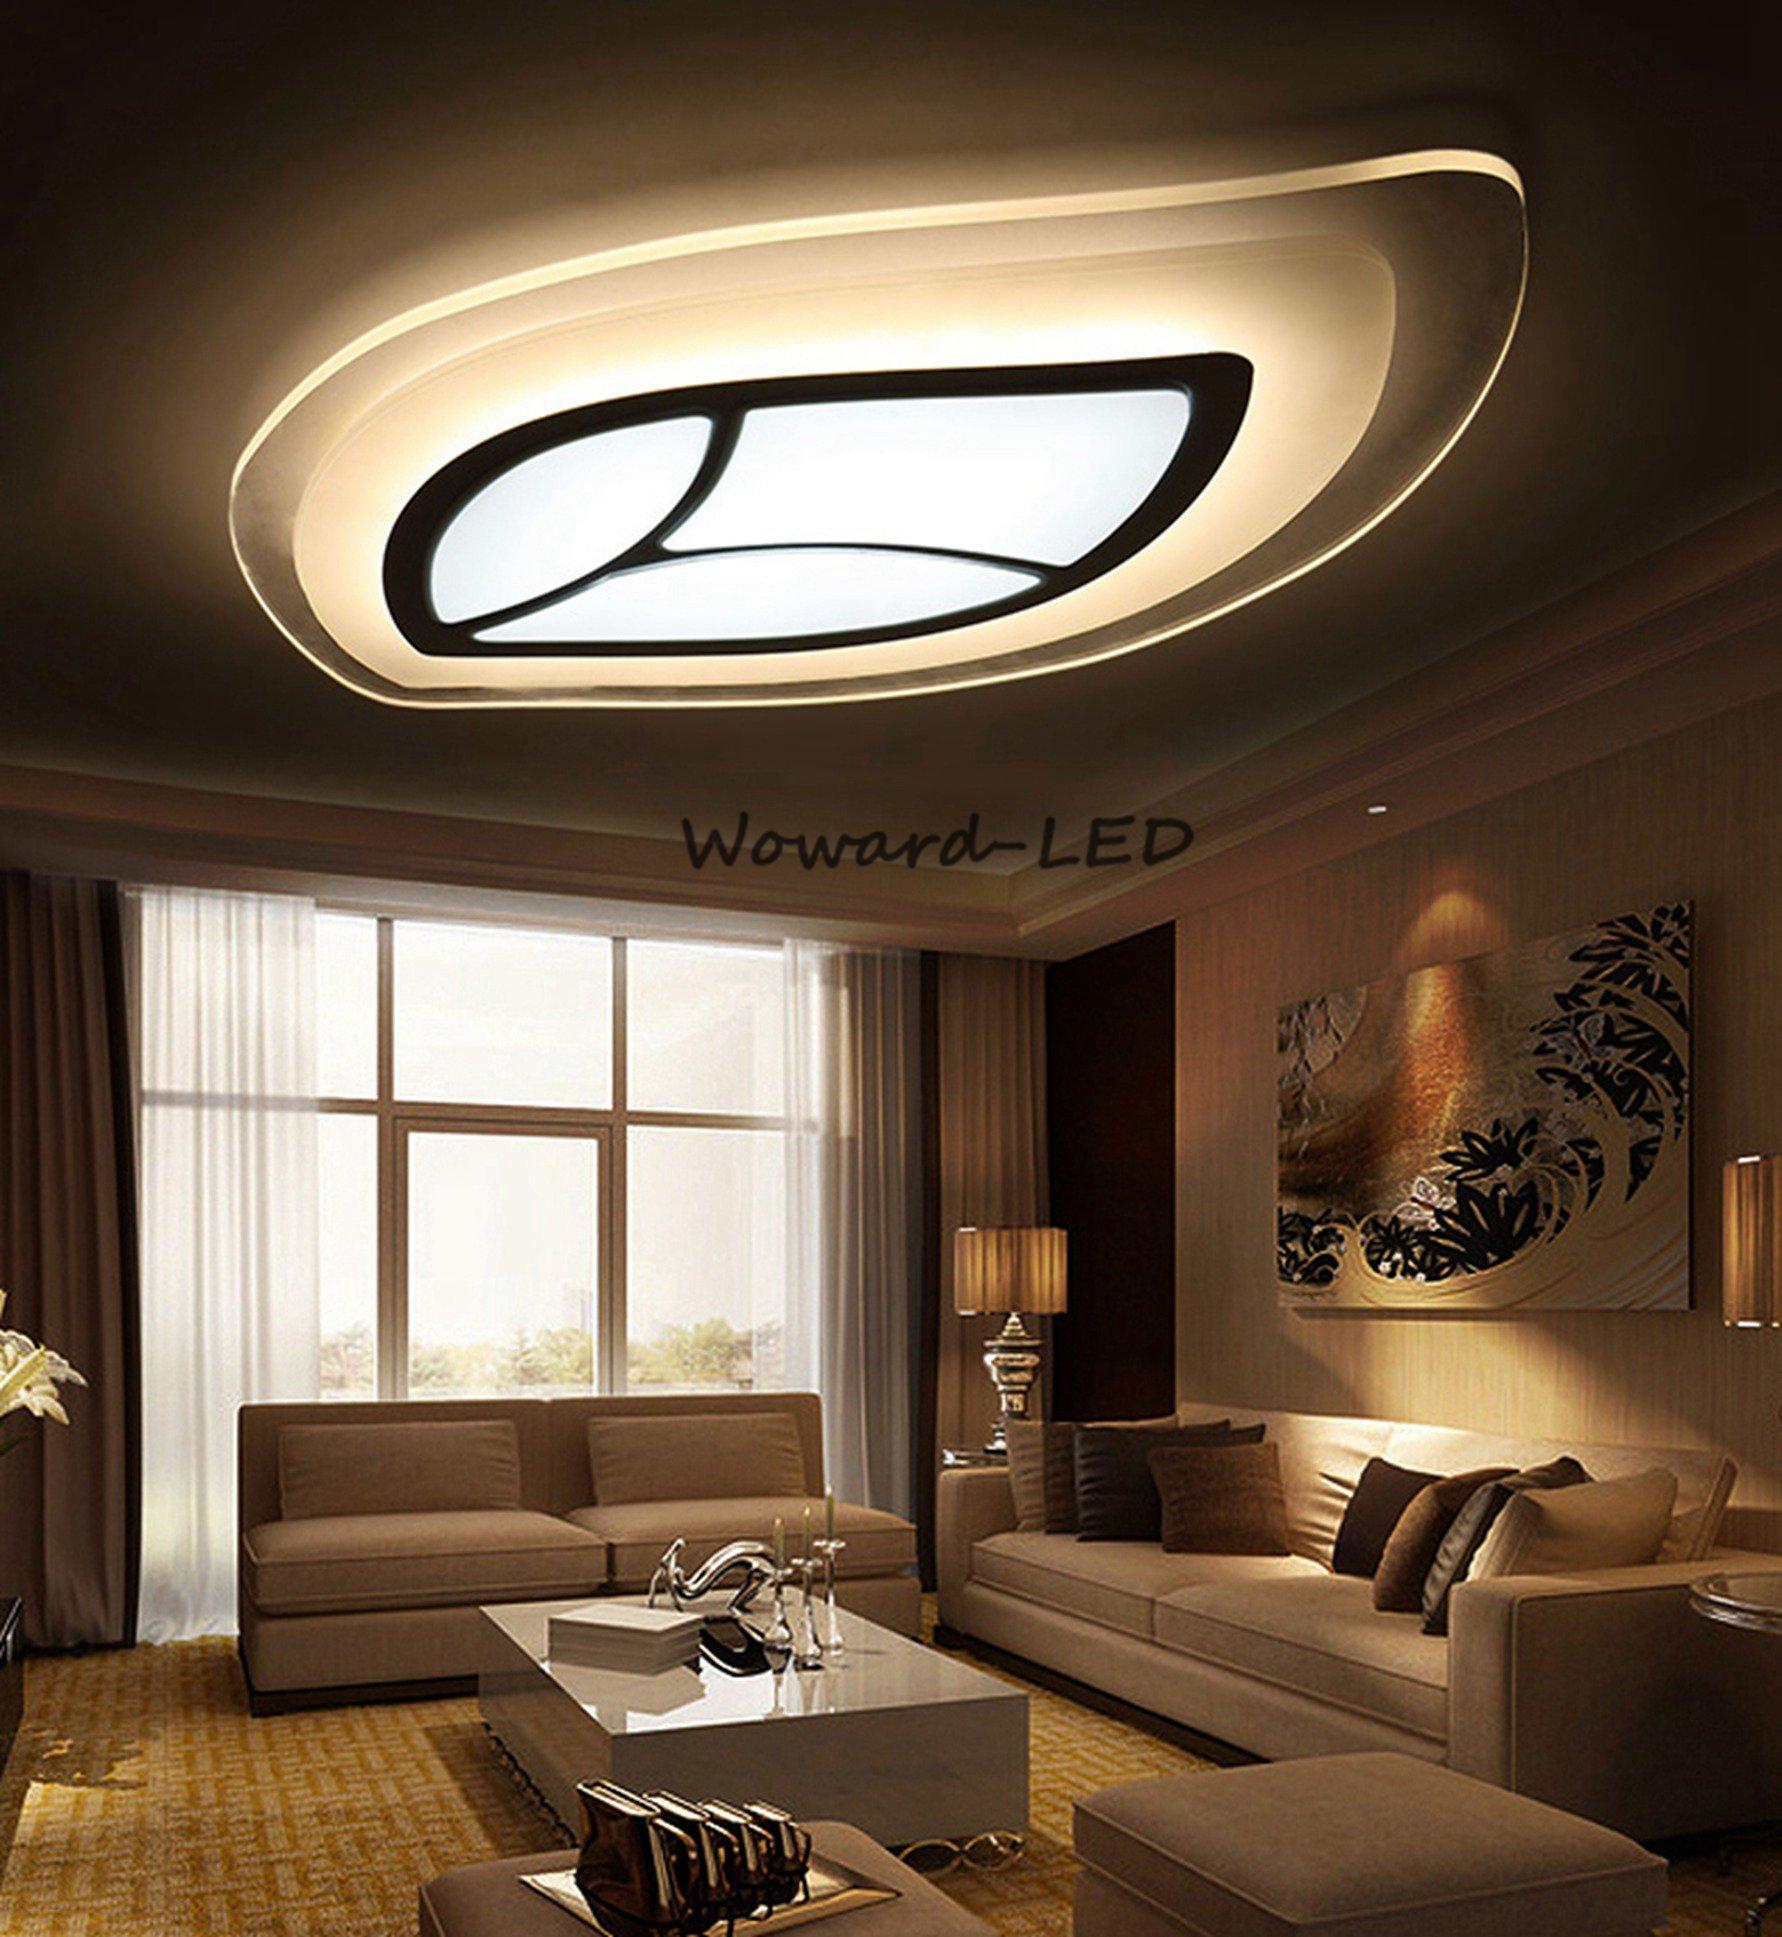 Full Size of Led Beleuchtung Wohnzimmer Planen Led Indirekte Beleuchtung Fürs Wohnzimmer Led Leuchten Für Wohnzimmer Led Beleuchtung Im Wohnzimmer Wohnzimmer Led Beleuchtung Wohnzimmer